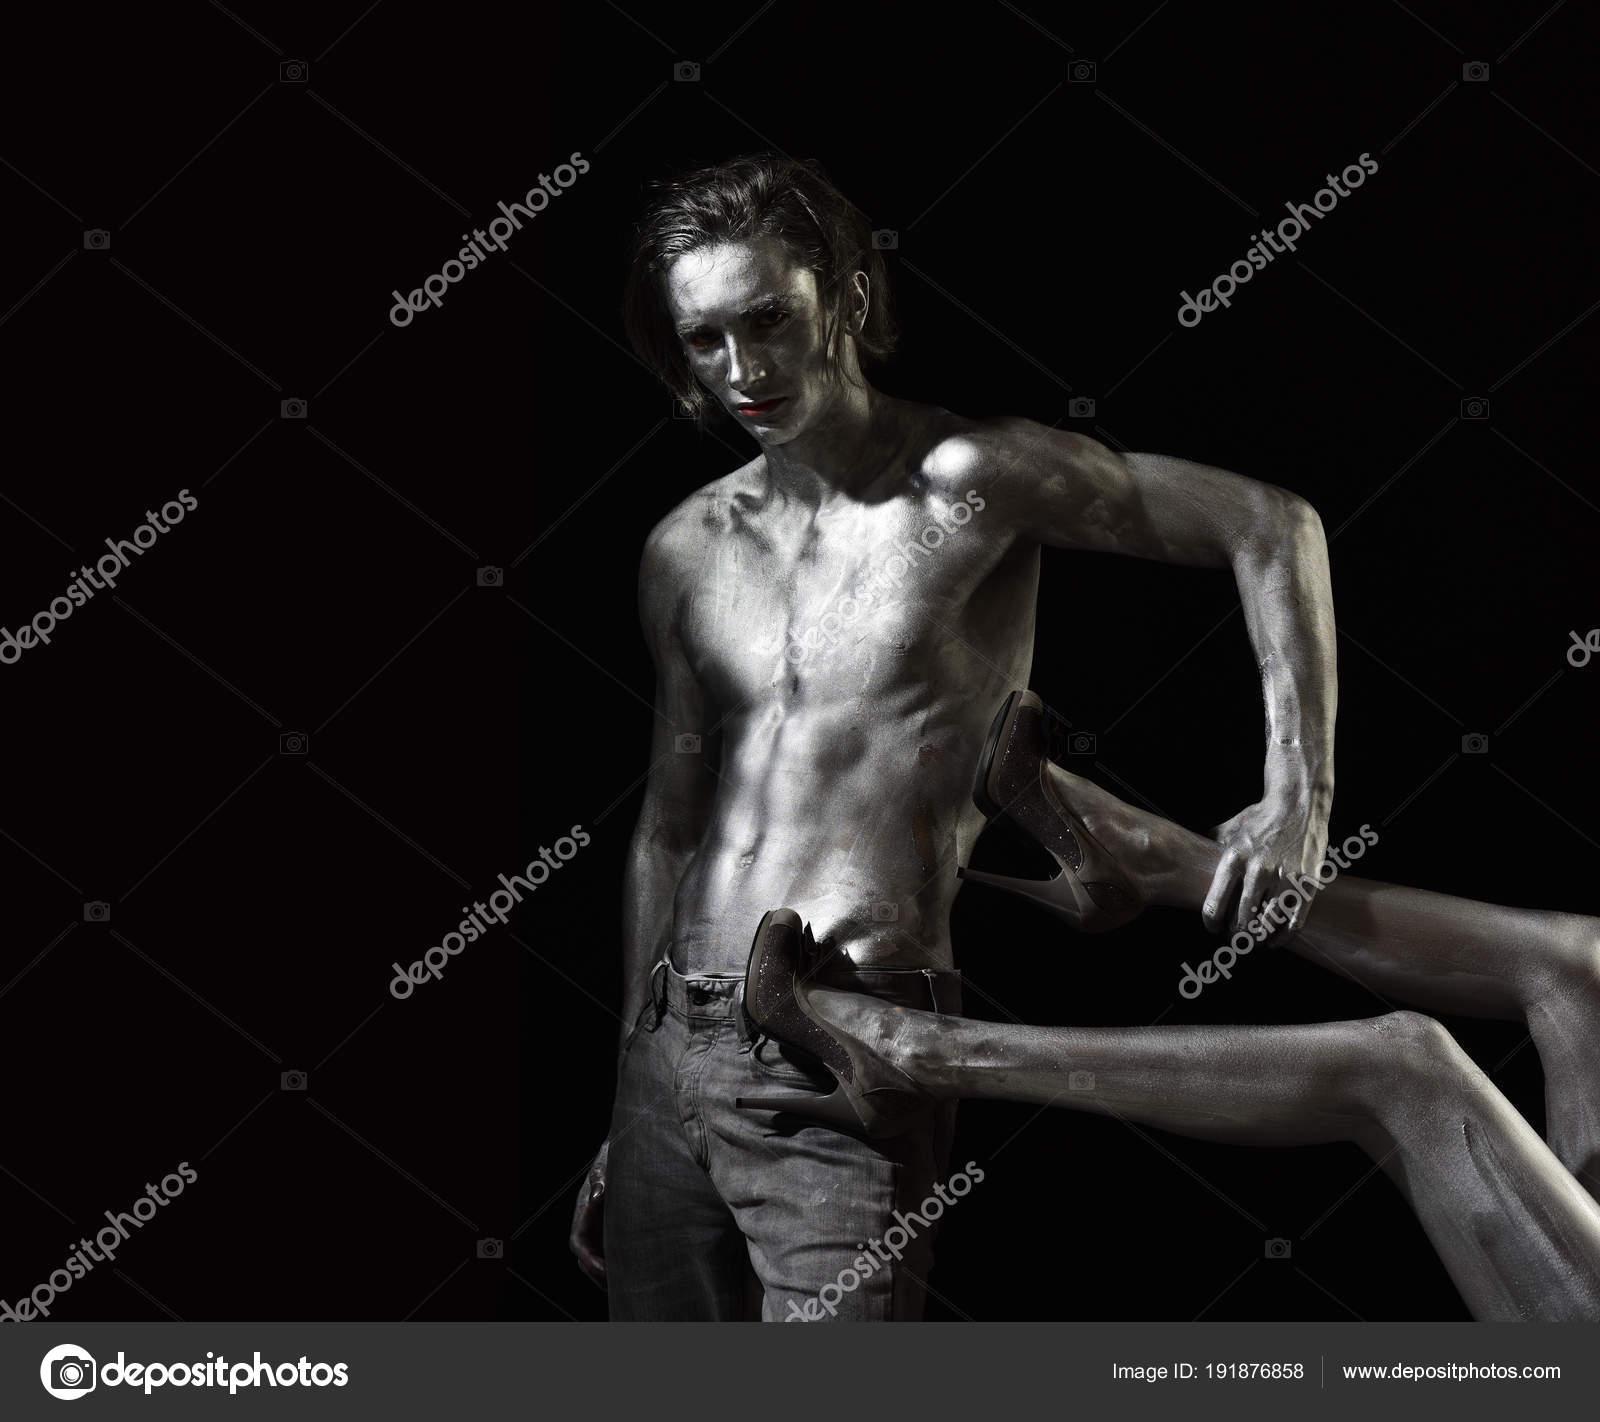 Vagina positions sex